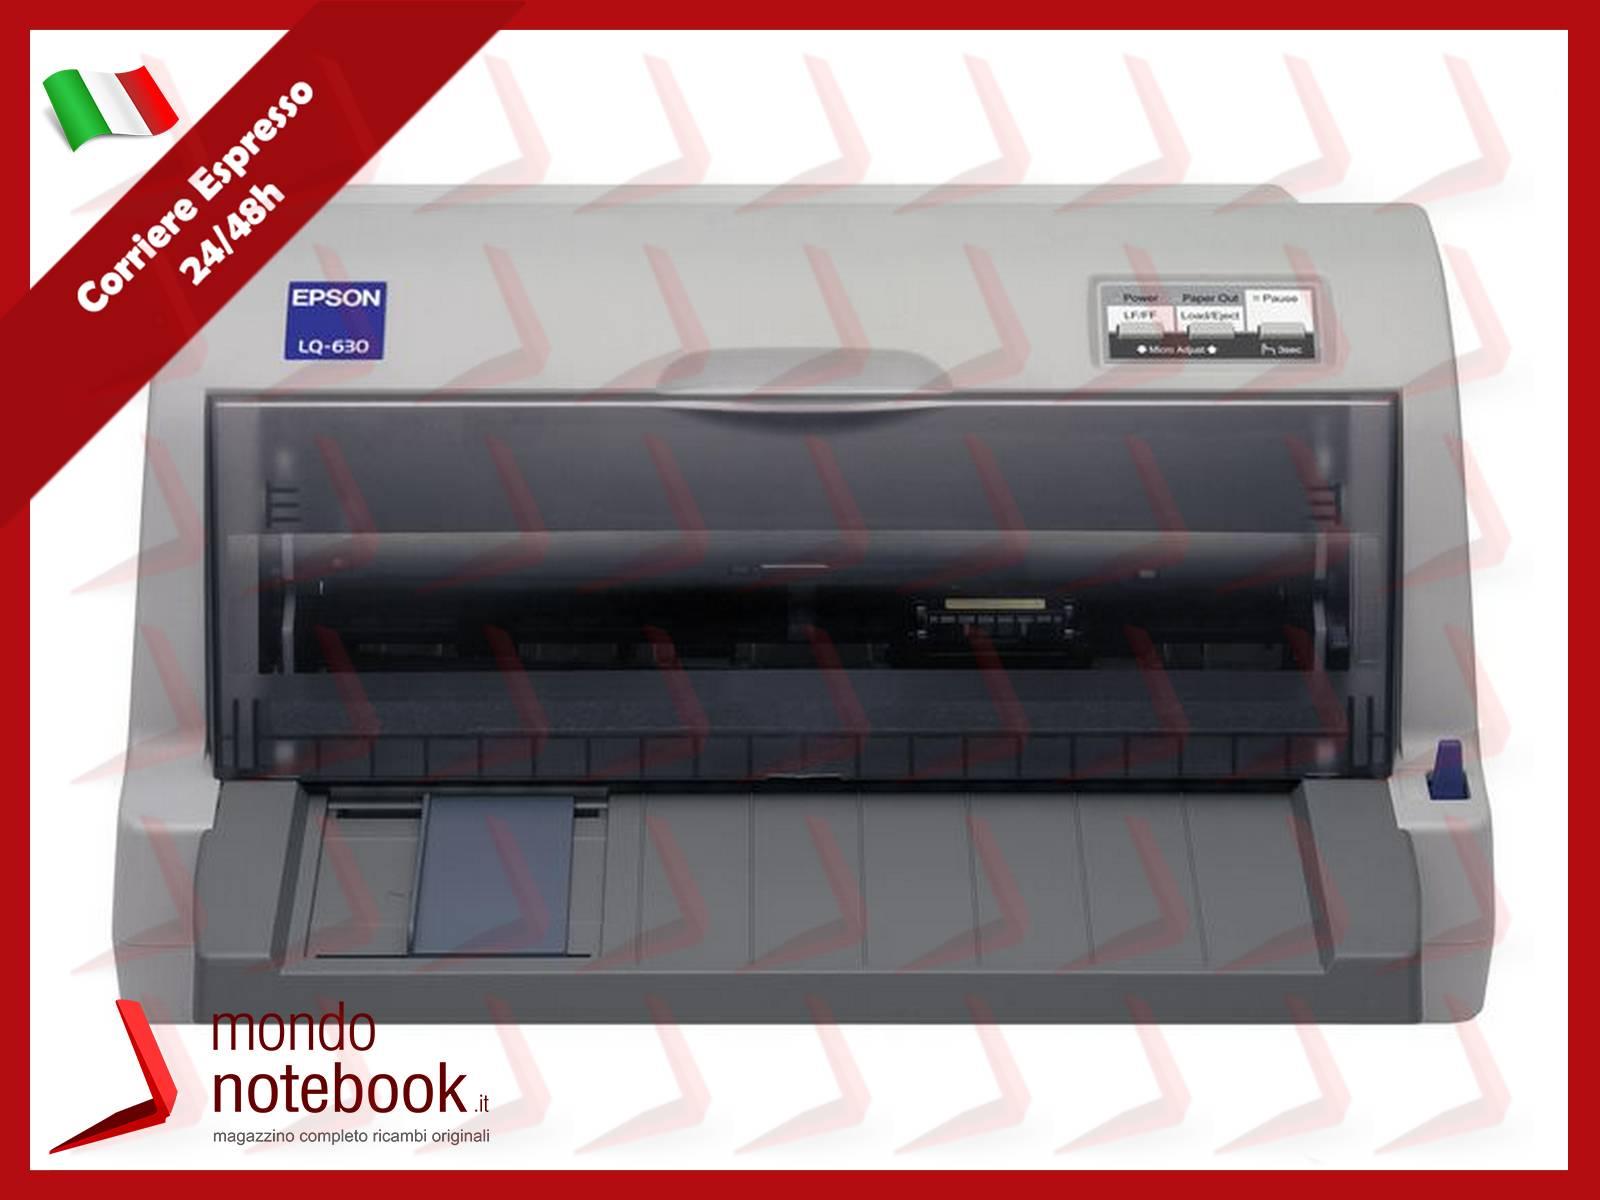 https://www.mondonotebook.it/17631/ventola-fan-cpu-toshiba-c650-c655-c655d-l650-l650d-l655-versione-3-pin.jpg